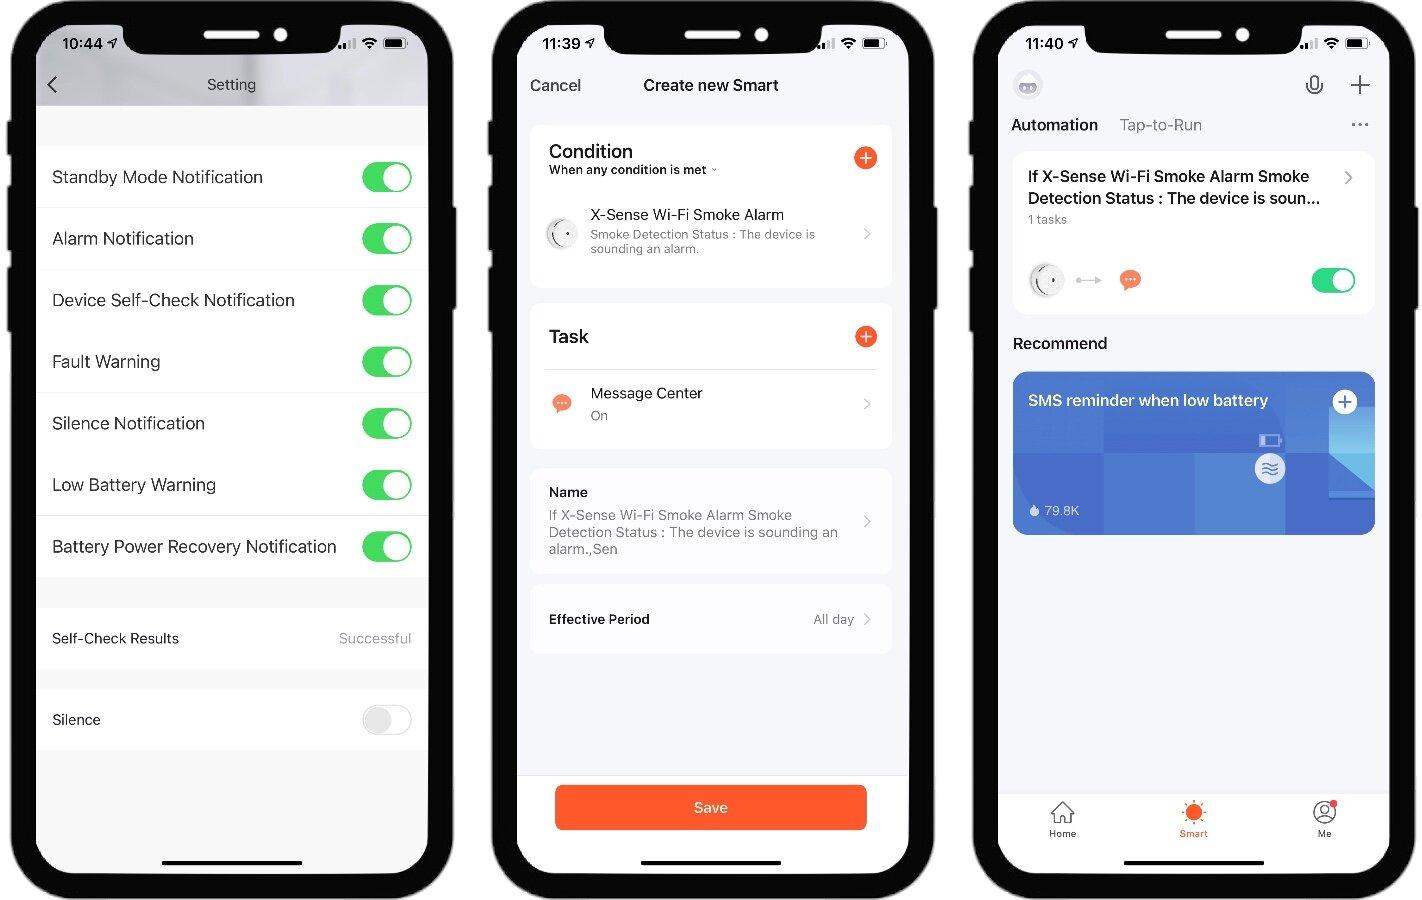 X-Sense configuration in the Smart Life app